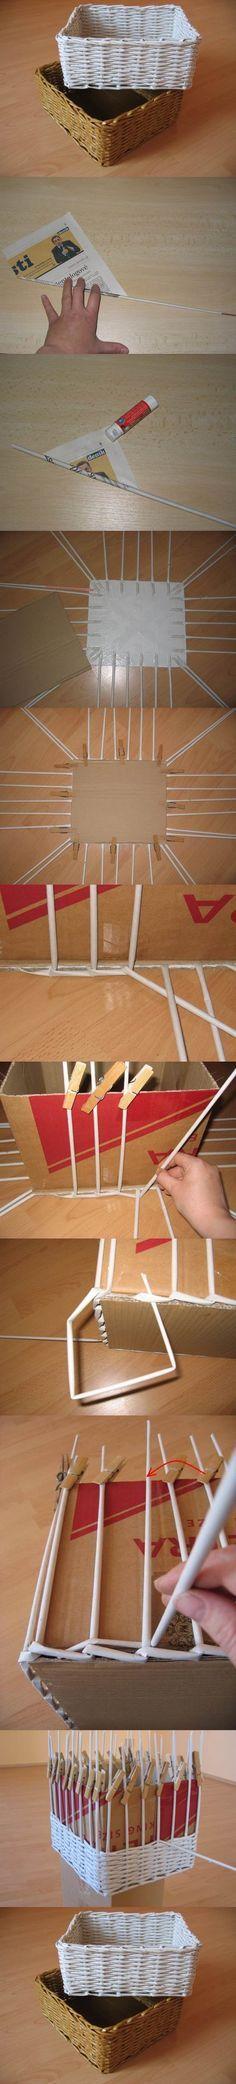 DIY Woven Paper Storage Box | iCreativeIdeas.com Follow Us on Facebook --> https://www.facebook.com/icreativeideas